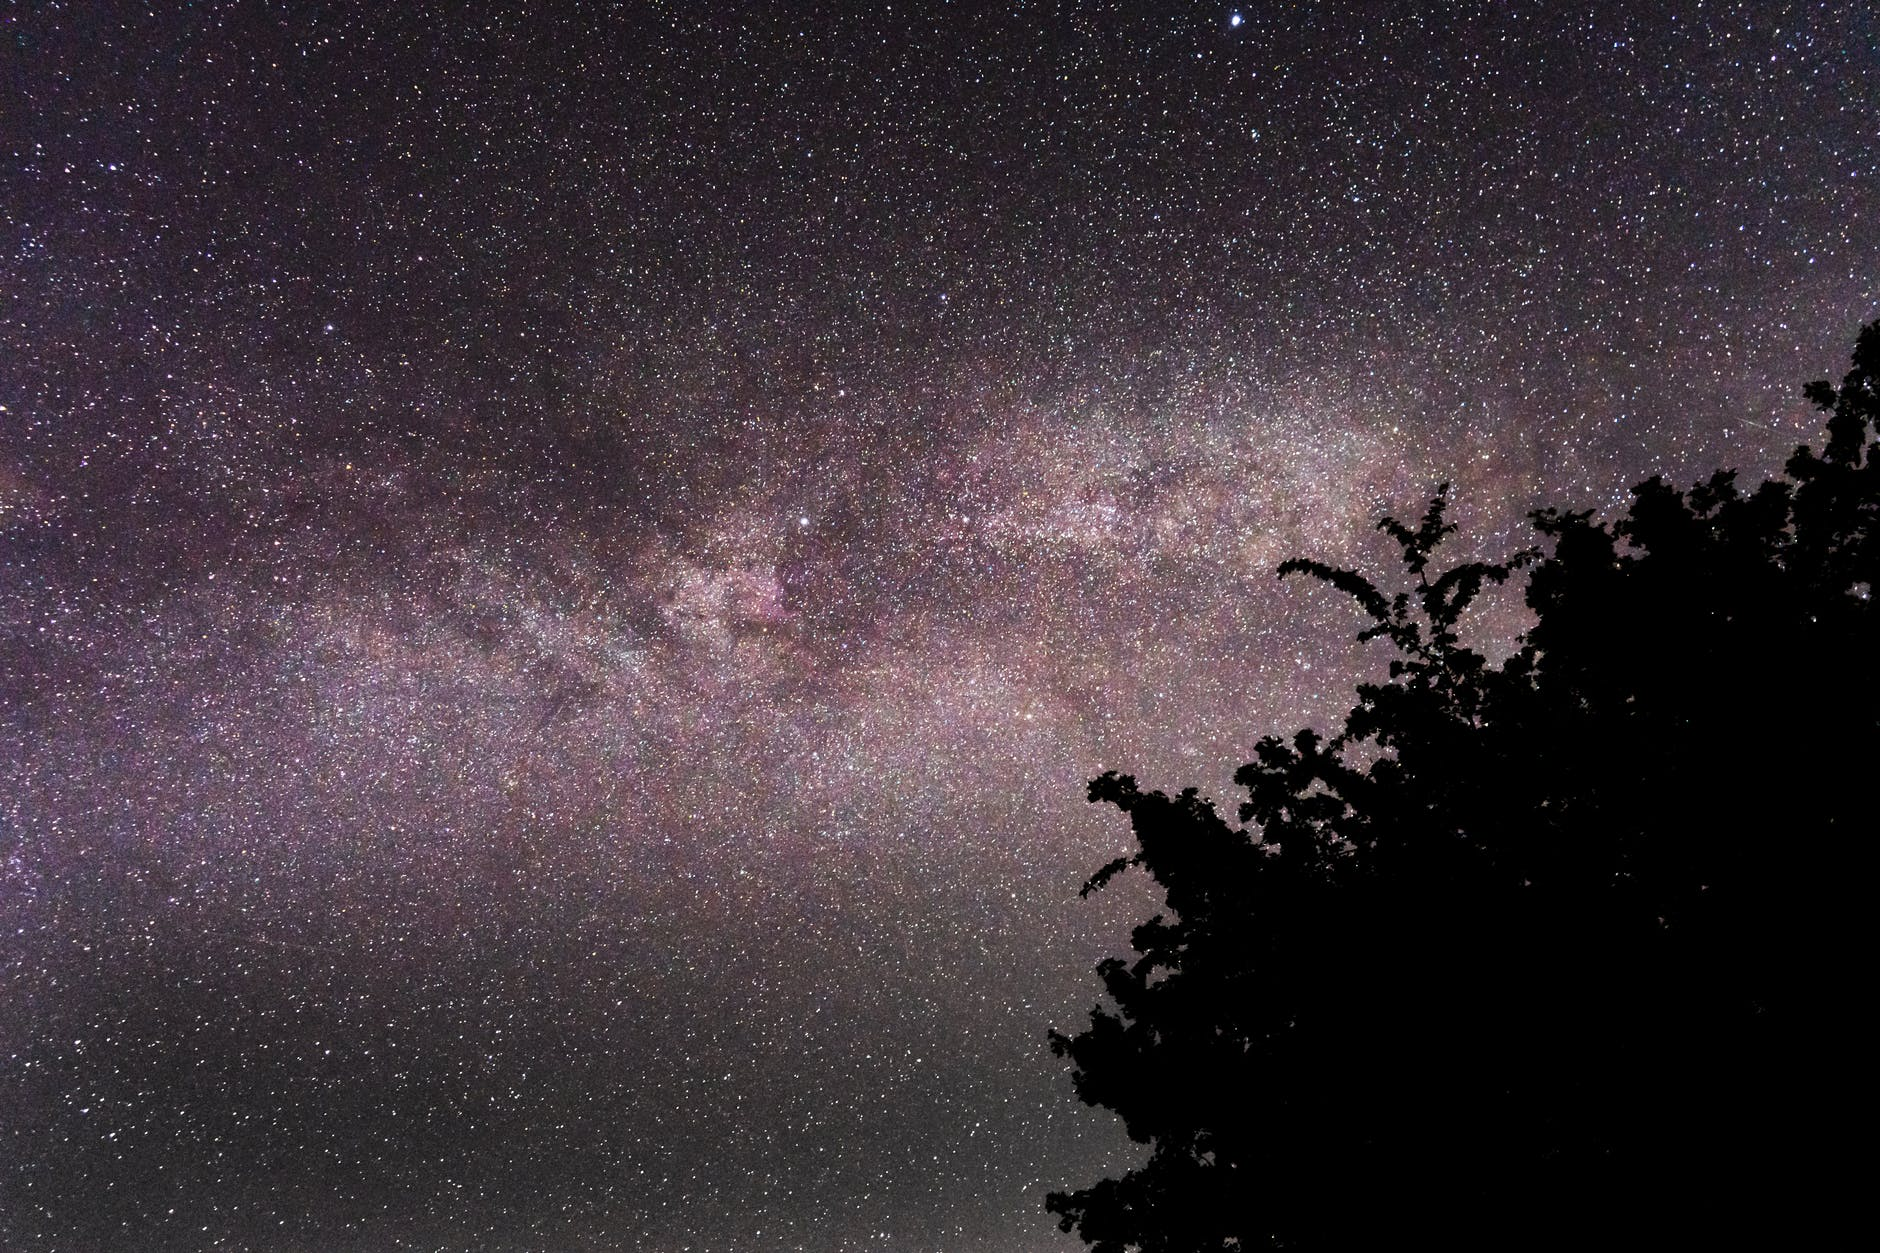 silhouette of tree under starry night sky